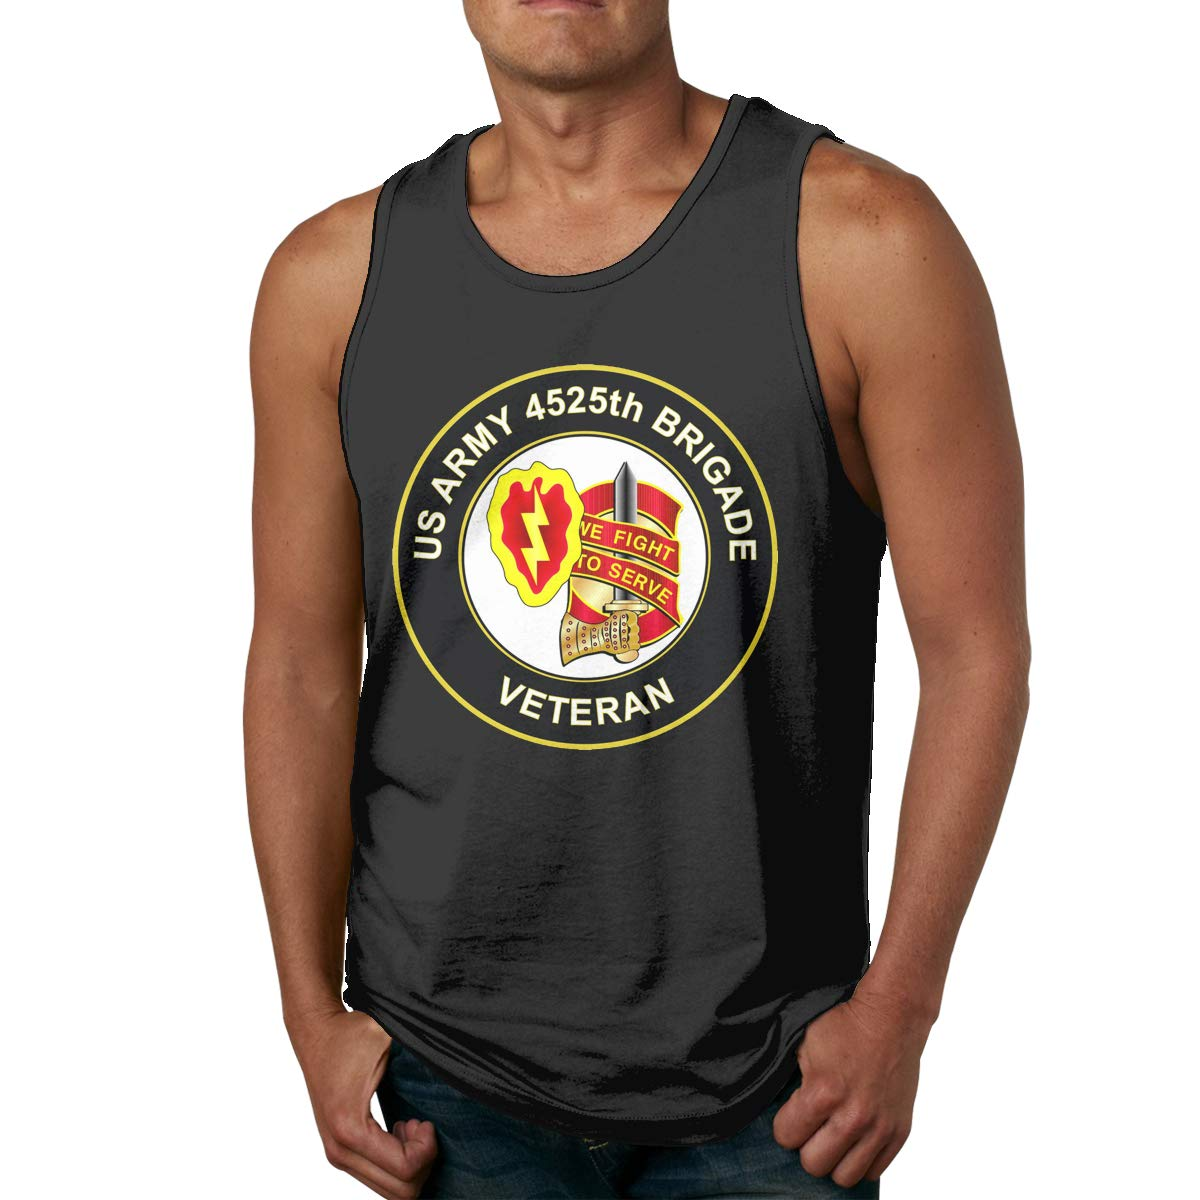 U.S Army 4525th Brigade Unit Crest Veteran Mens Cotton Undershirts Crew Neck Tank Tops